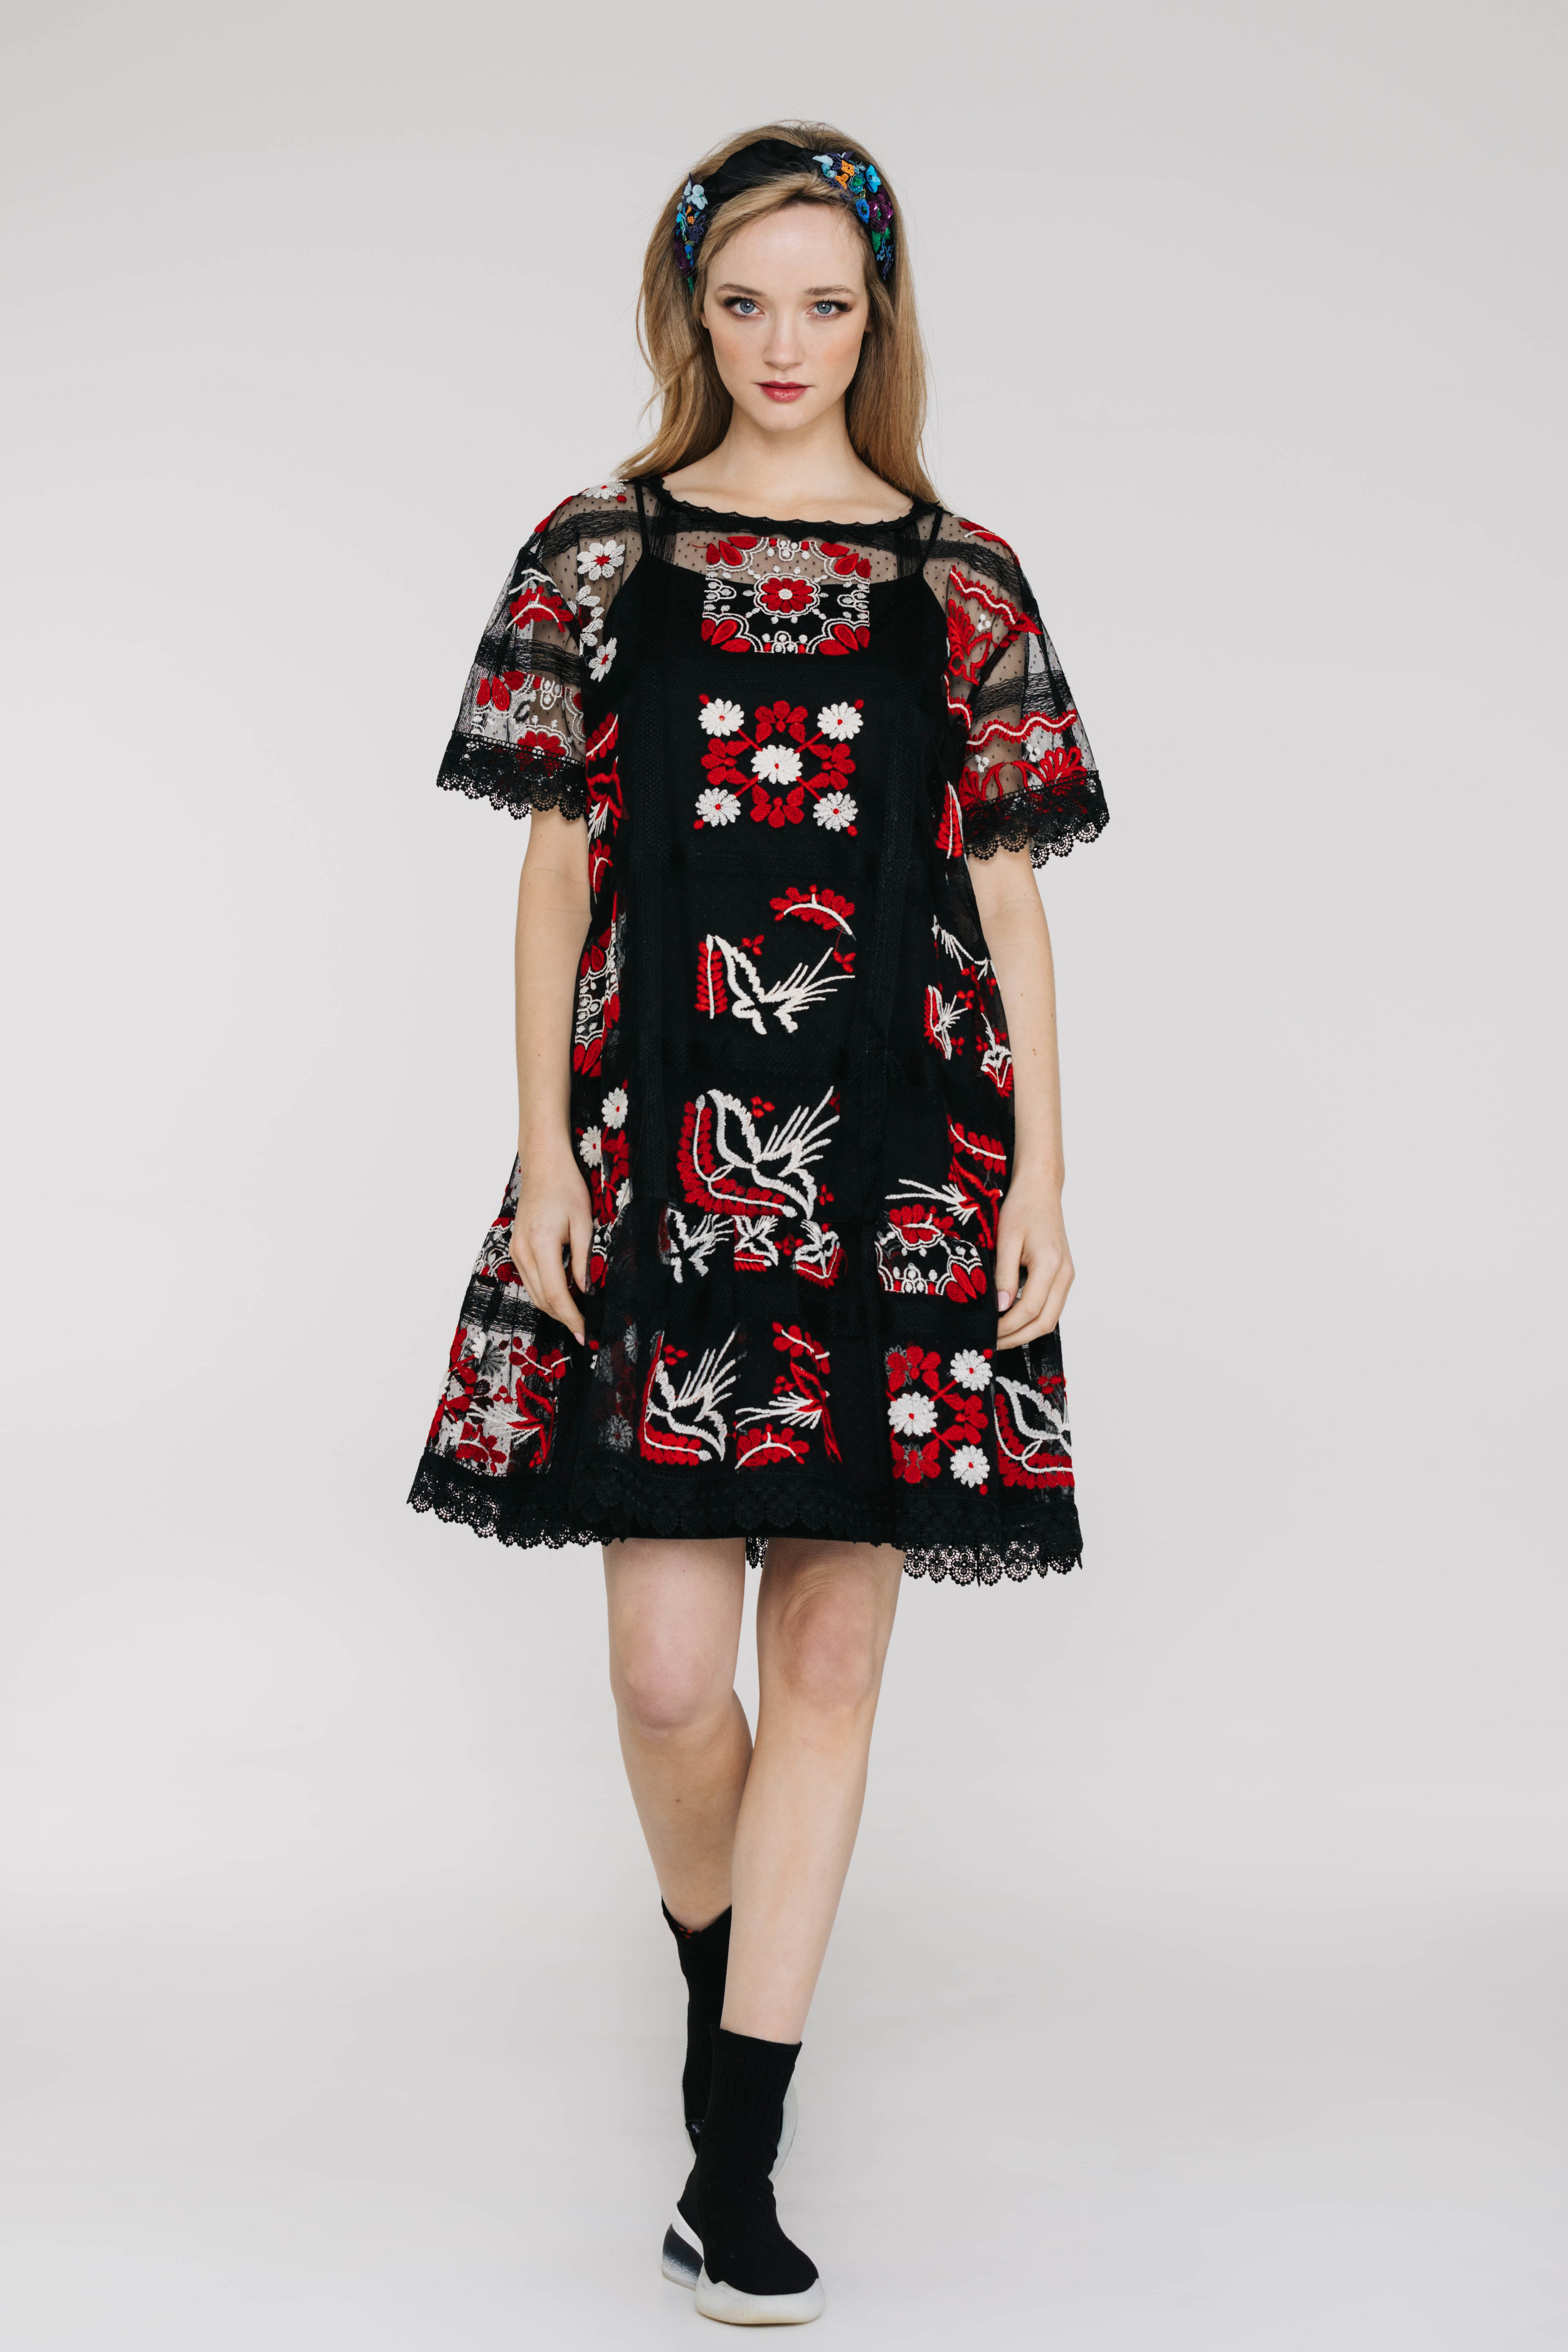 Tulip Dress 6440N Windows Black